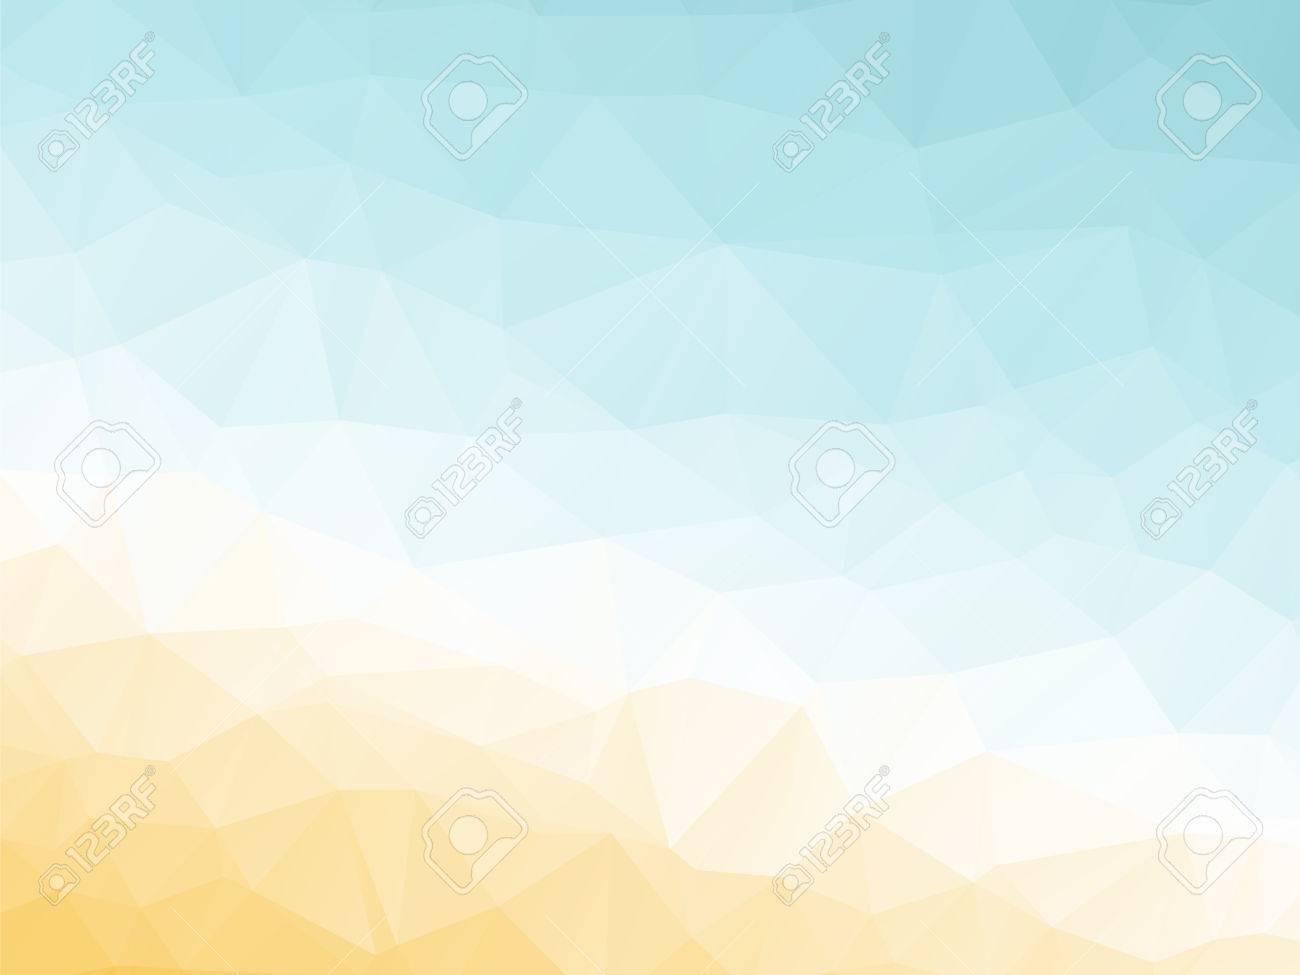 Abstract Triangular Yellow White Orange Summer Background Stock Vector